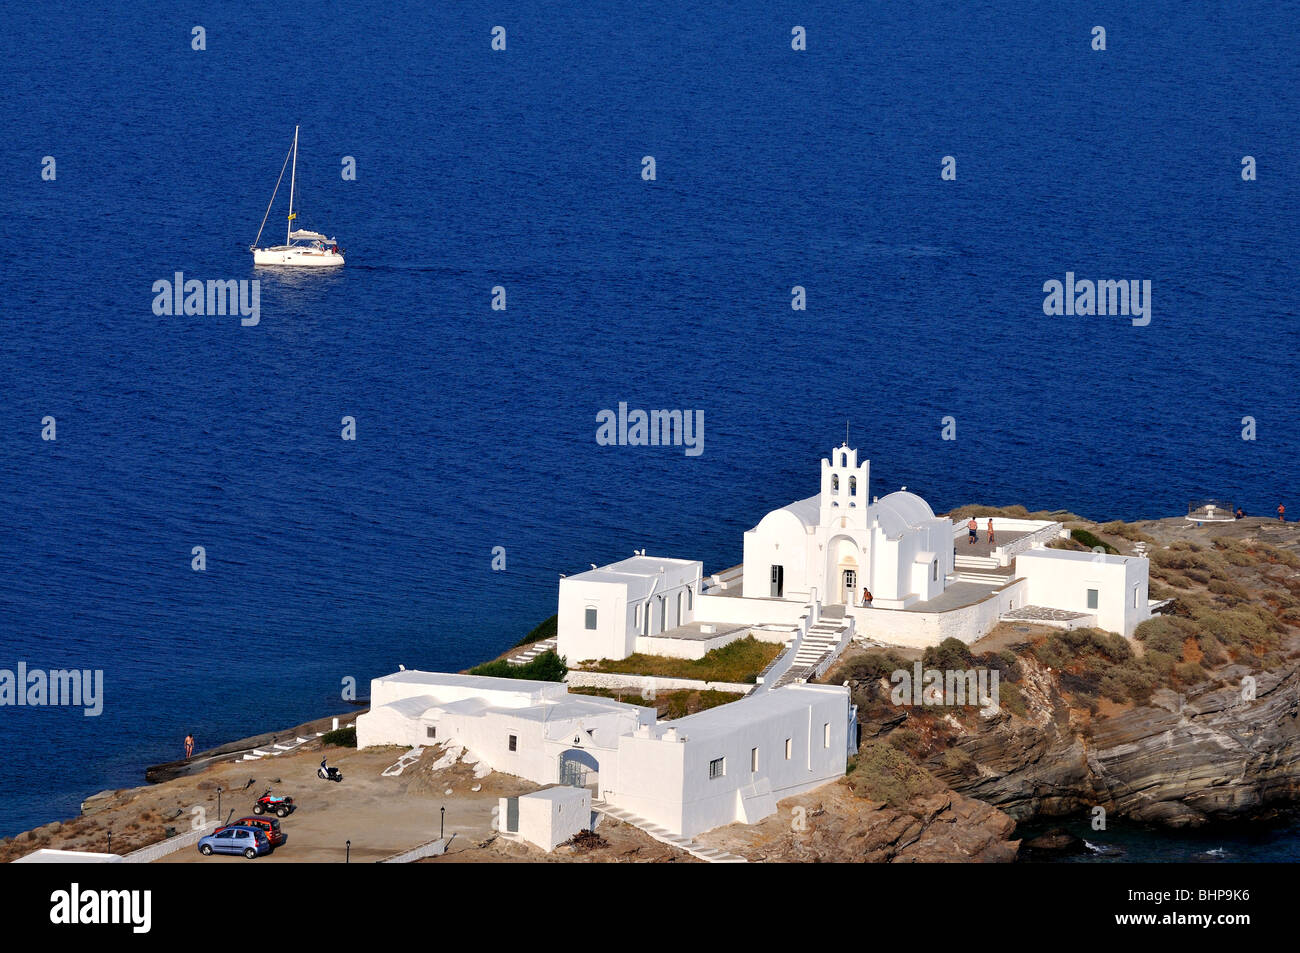 Chrisopigi monastery, Sifnos island, Greece Stock Photo